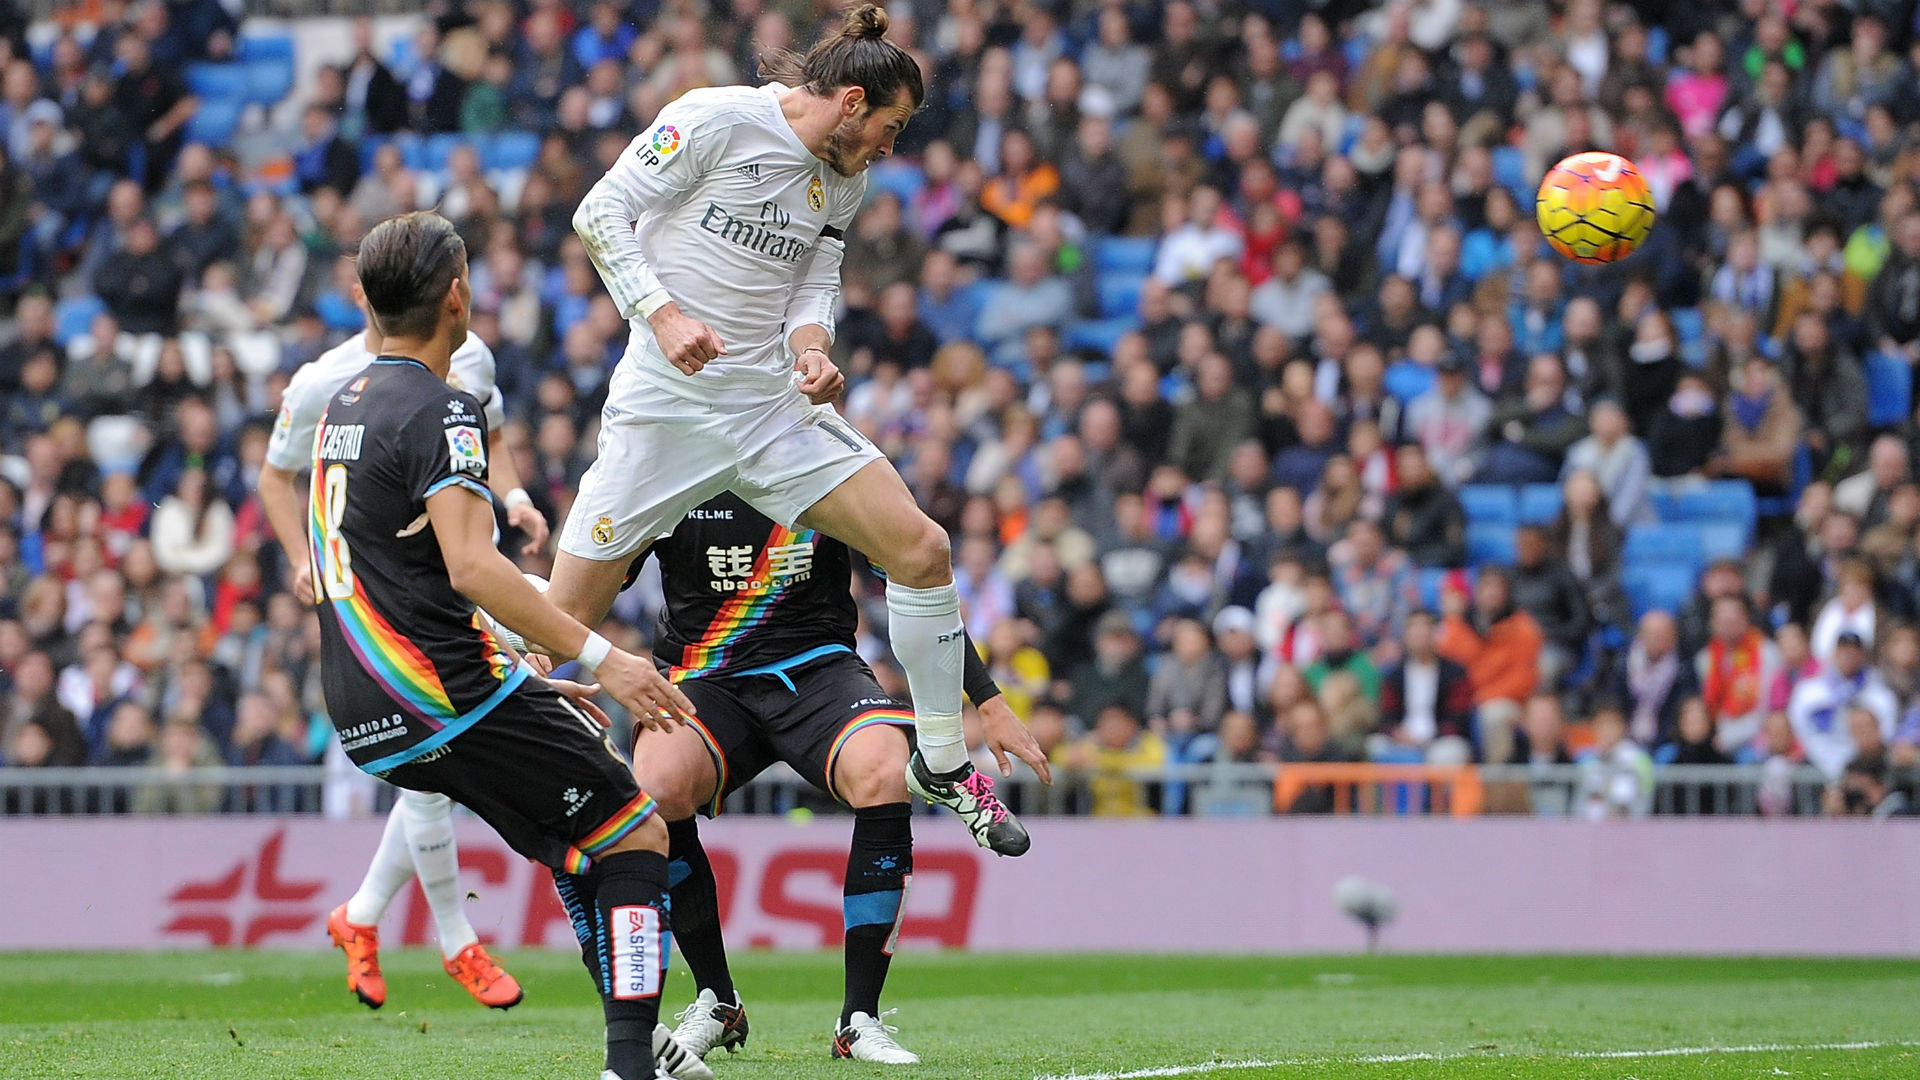 Gareth Bale Real Madrid vs Rayo Vallecano 2015/2016